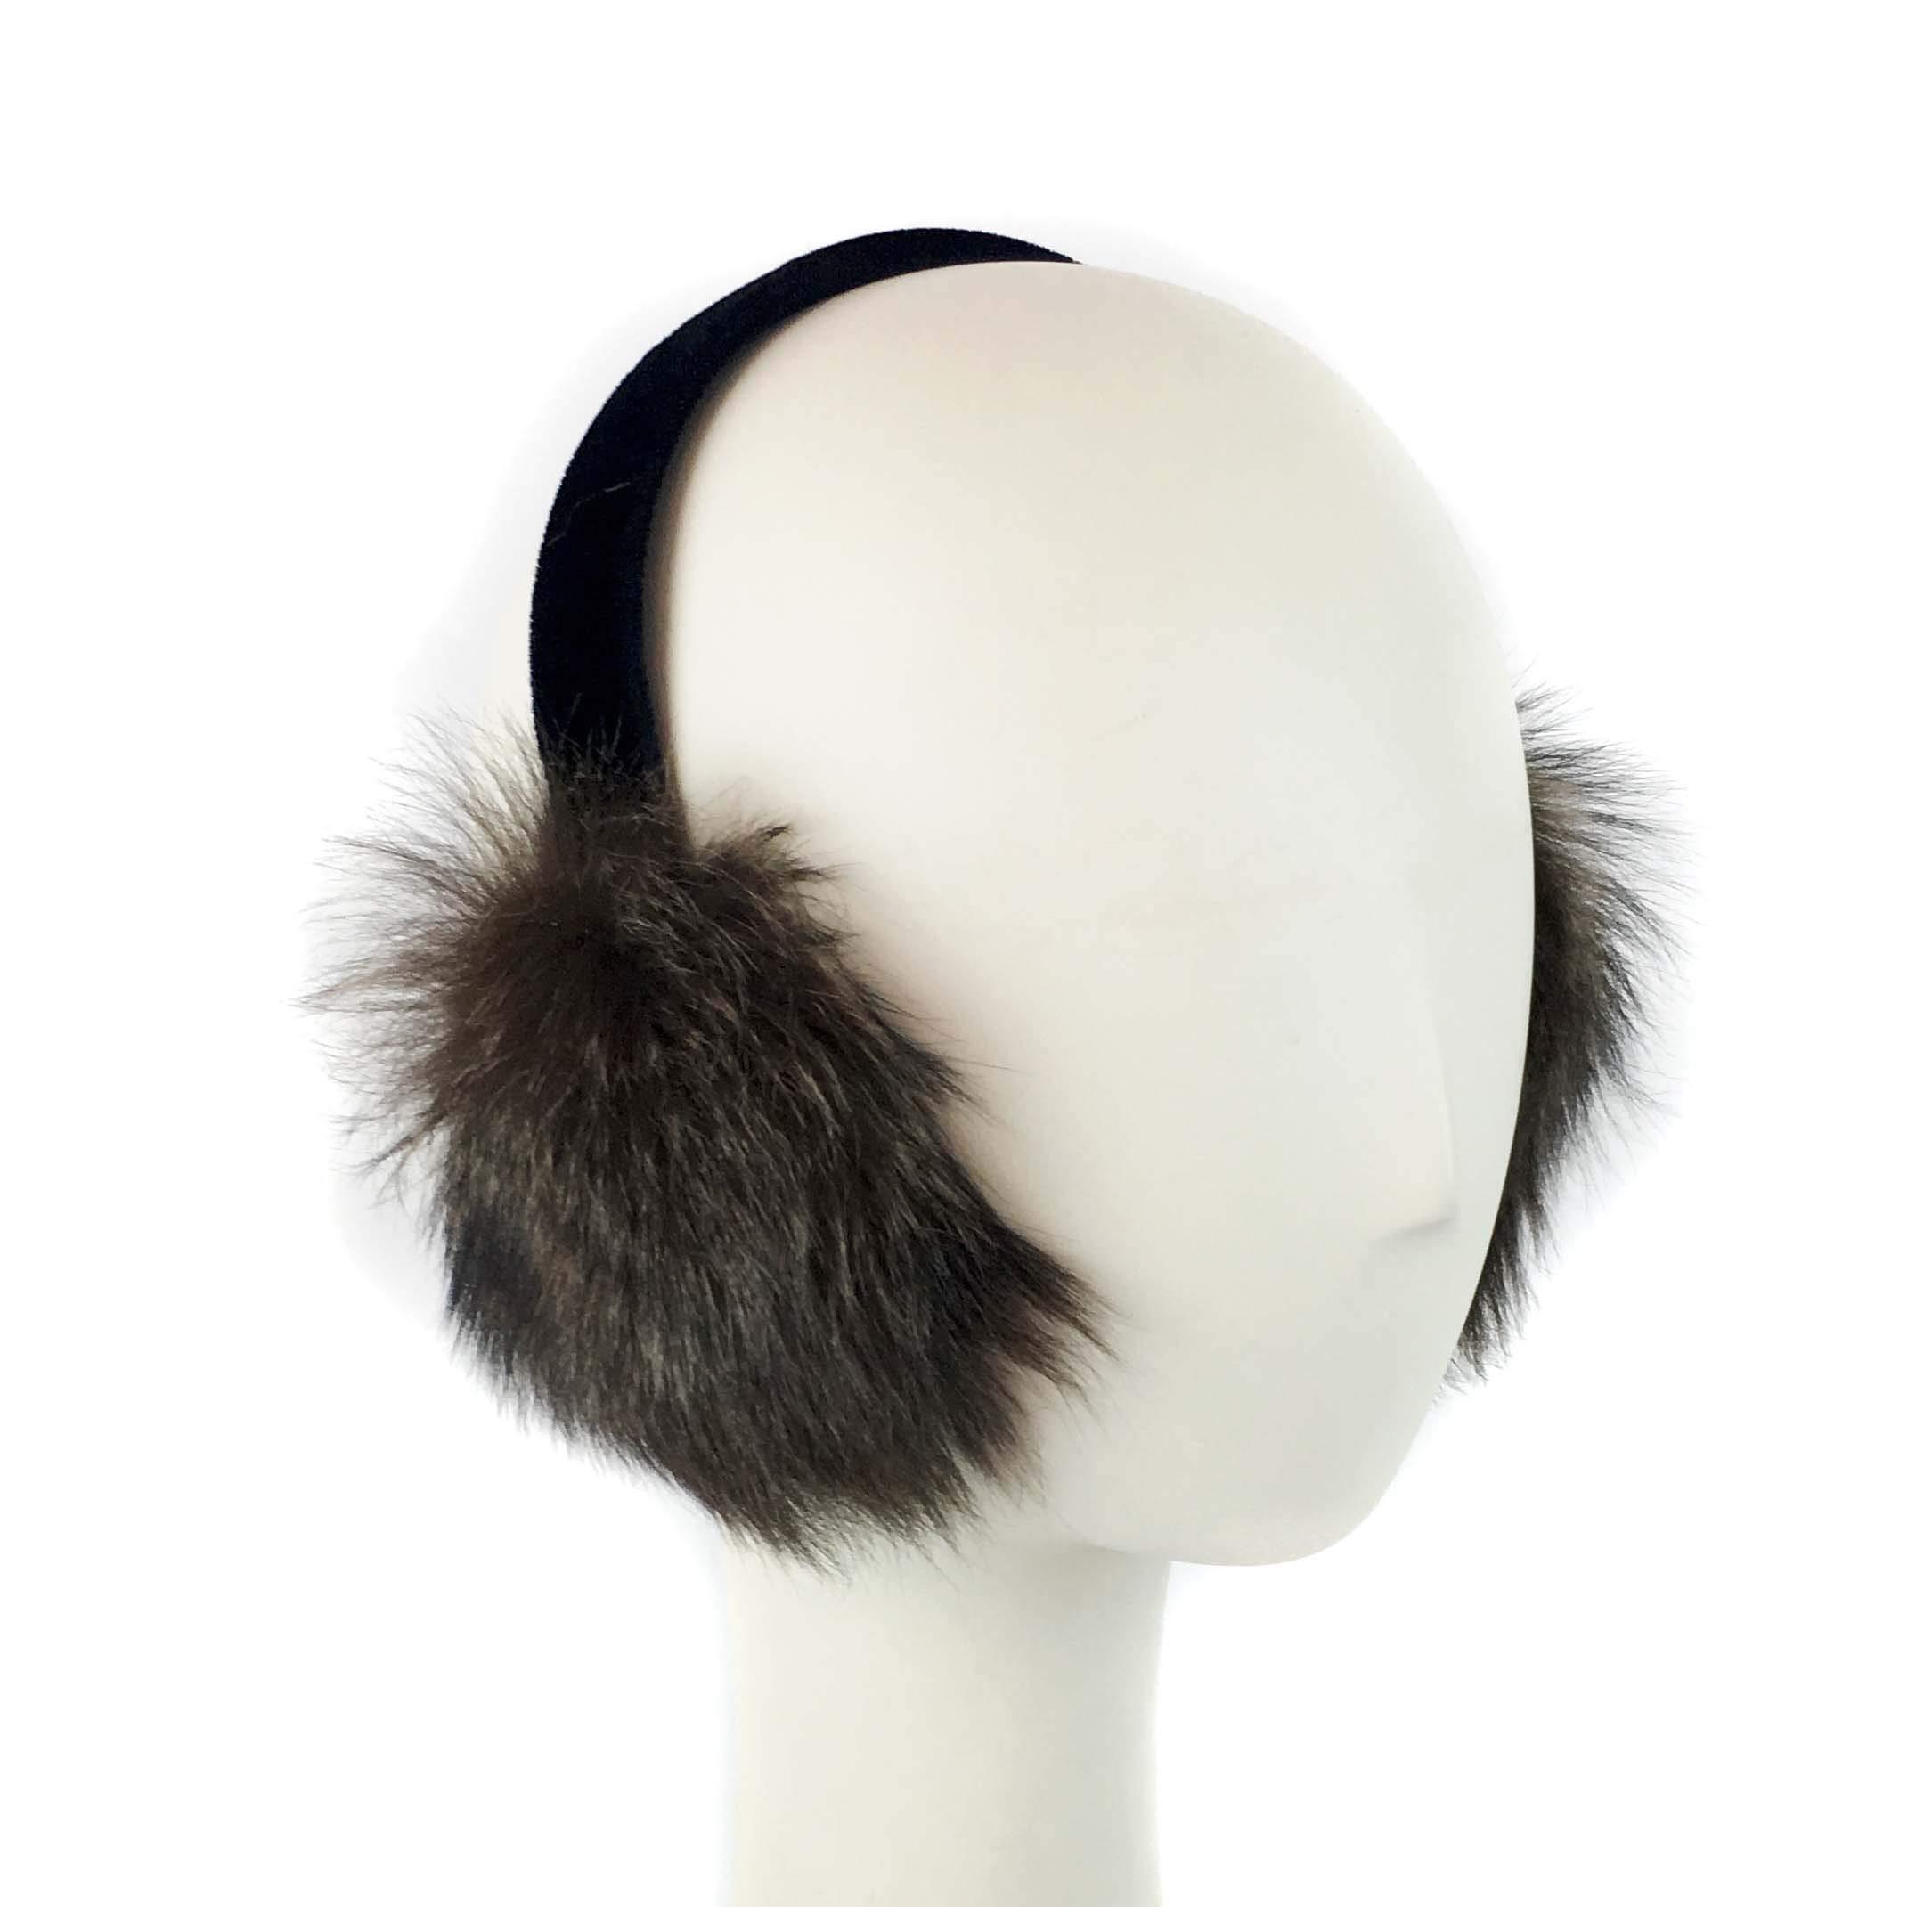 Toscana Sheepskin Fur Earmuff on Velvet Band (Brown Raccoon)